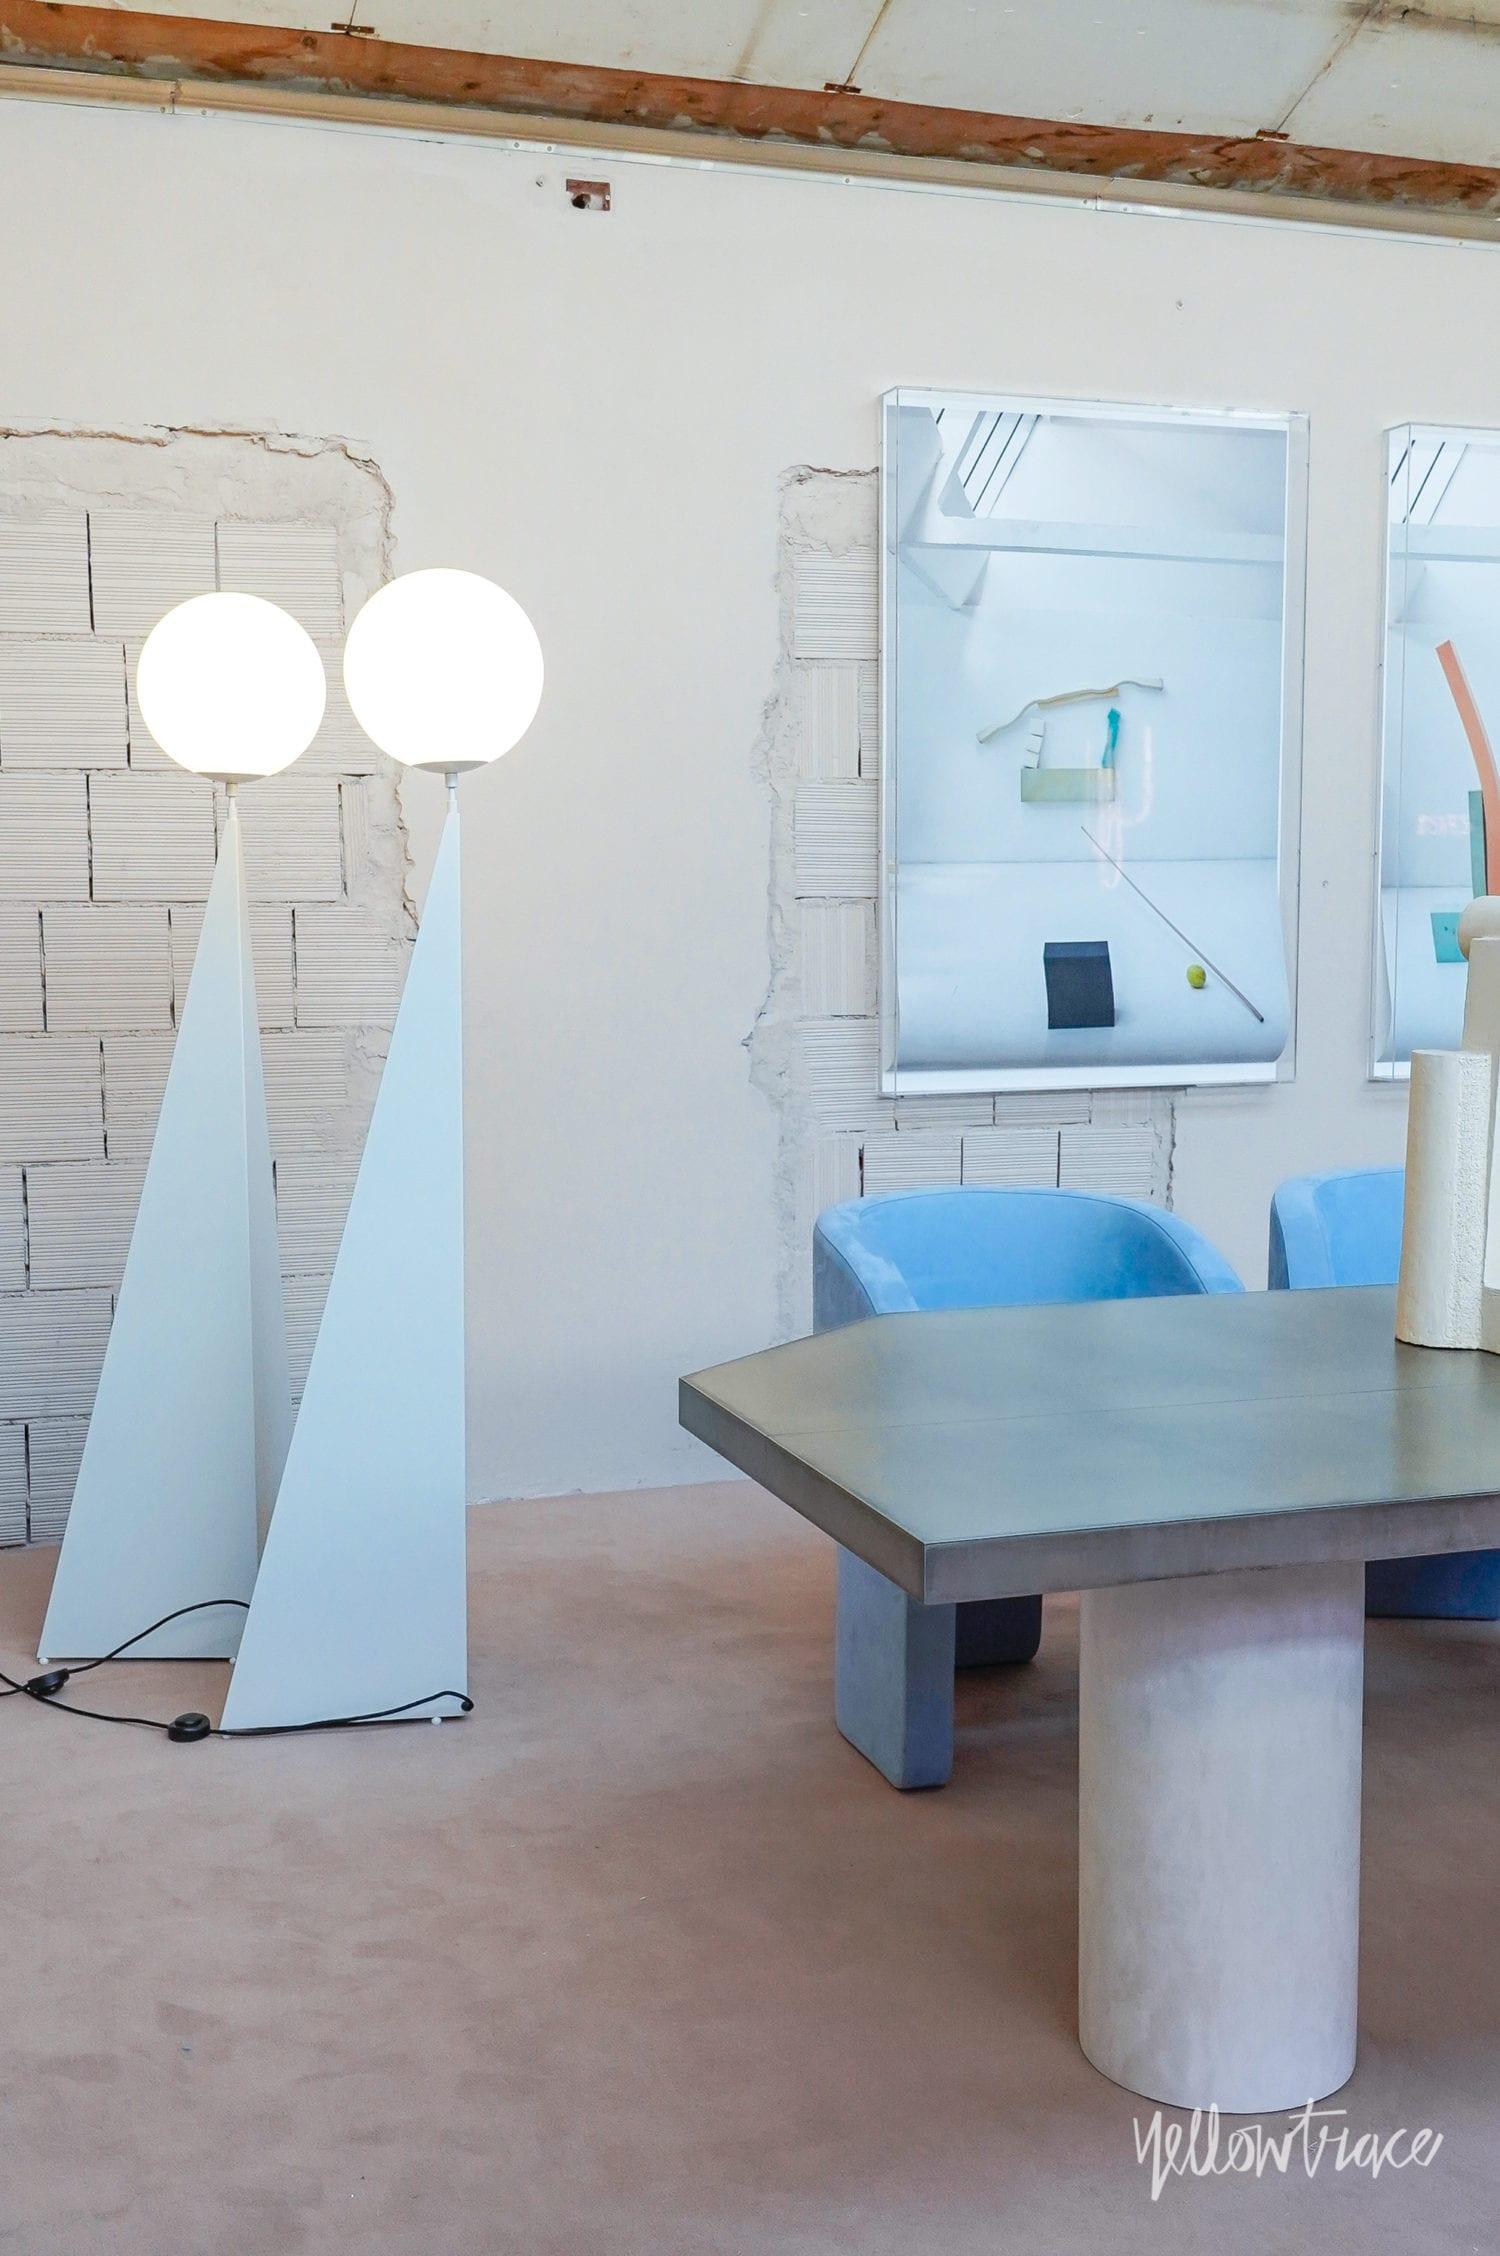 Les Arcanistes Studiopepe At Milan Design Week 2019 Photo Nick Hughes Yellowtrace 08